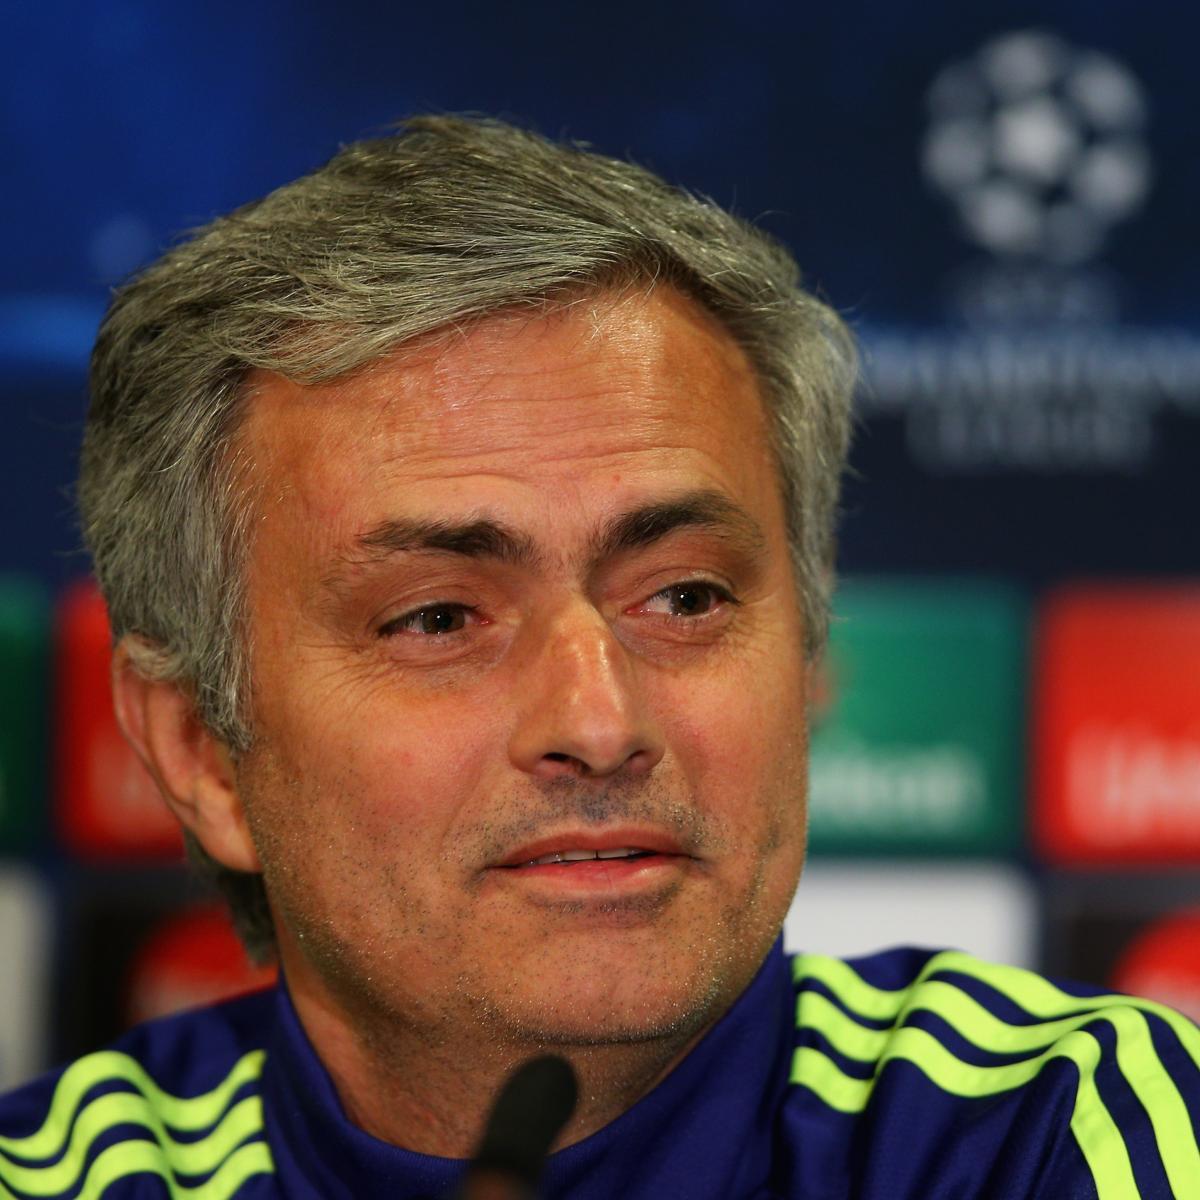 Psg Retain Champions League Favouritism Ahead Of: Jose Mourinho Rules Out Chelsea Win Bonuses Ahead Of PSG